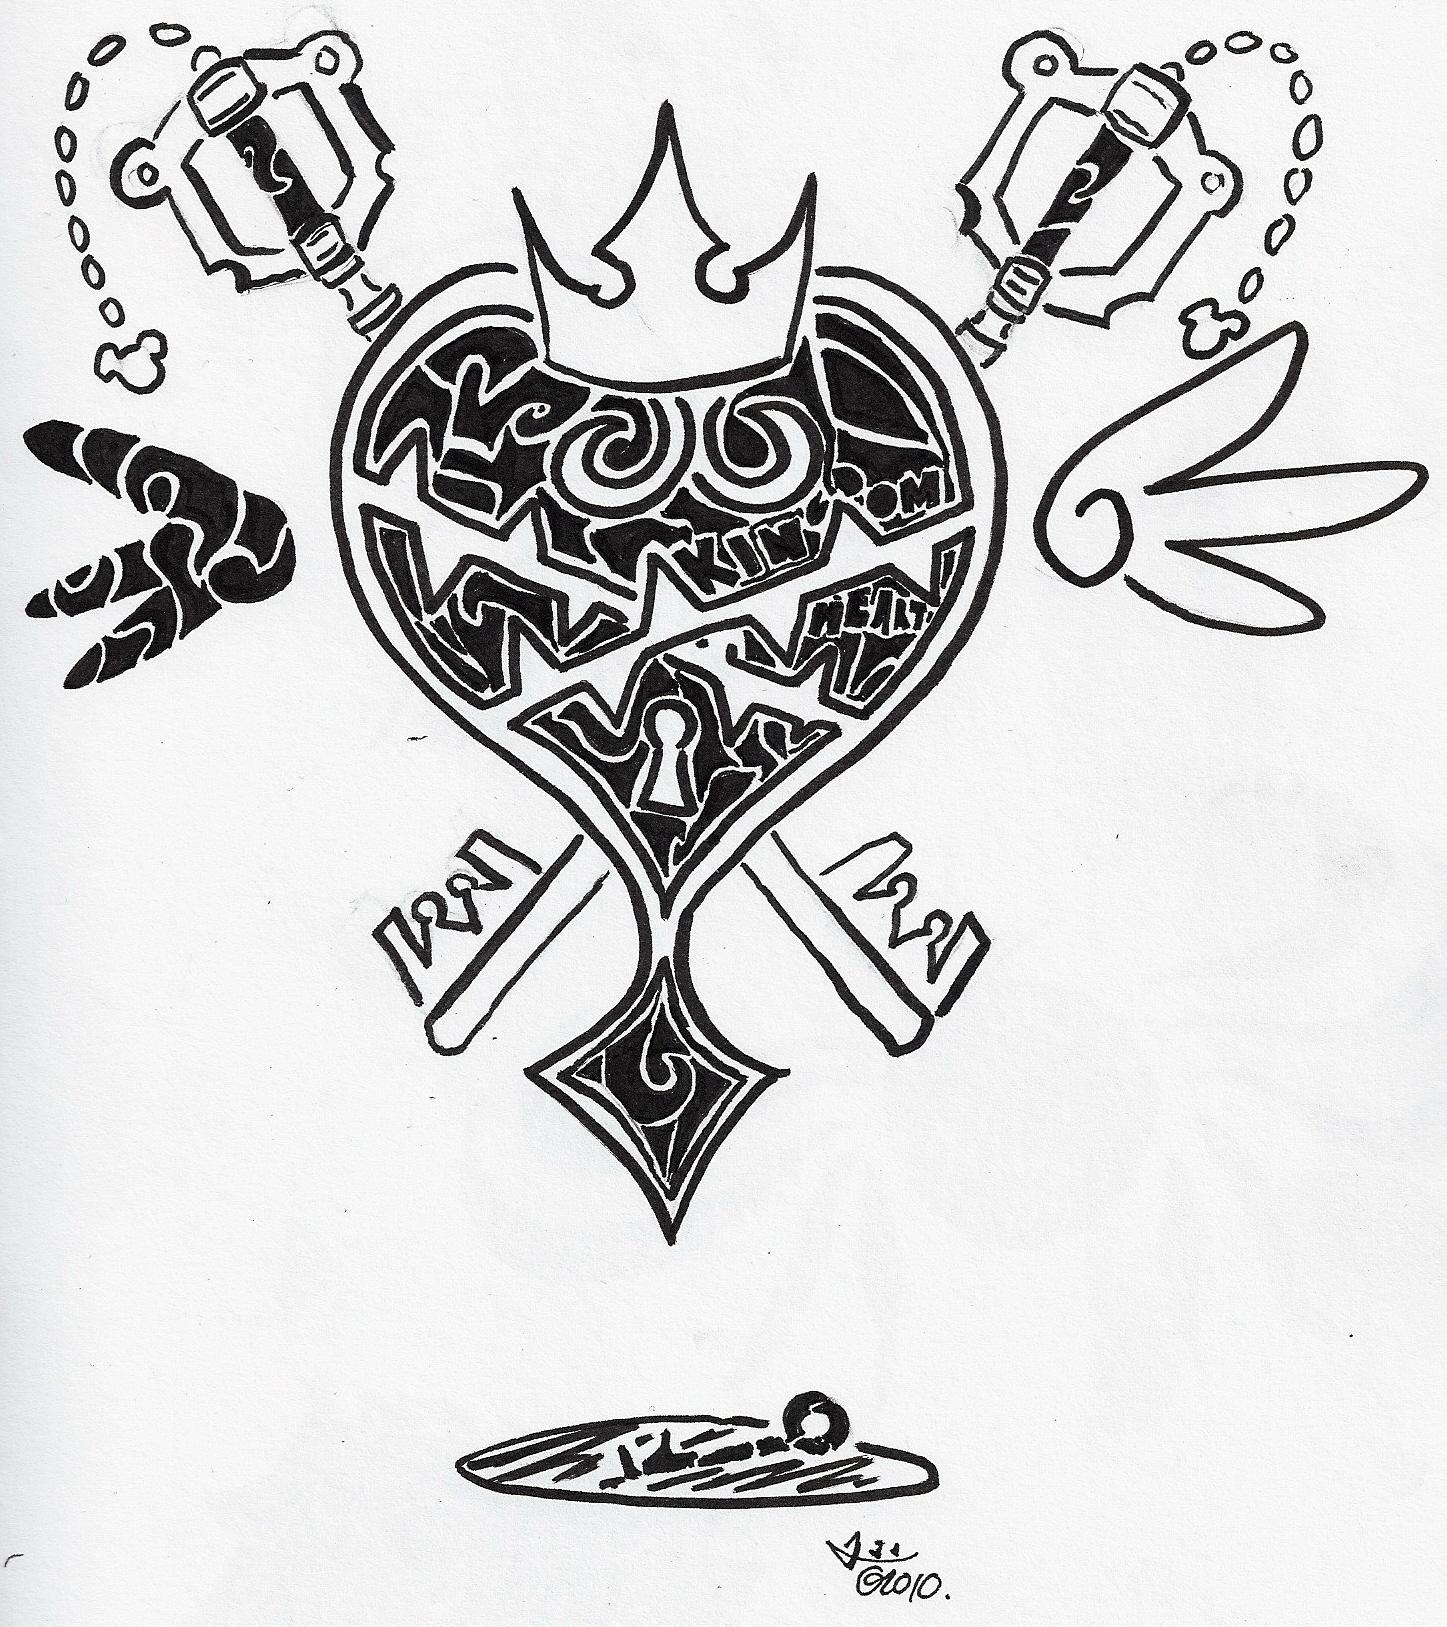 Kingdom Hearts Oathkeeper And Oblivion Tattoo 95660 Enews